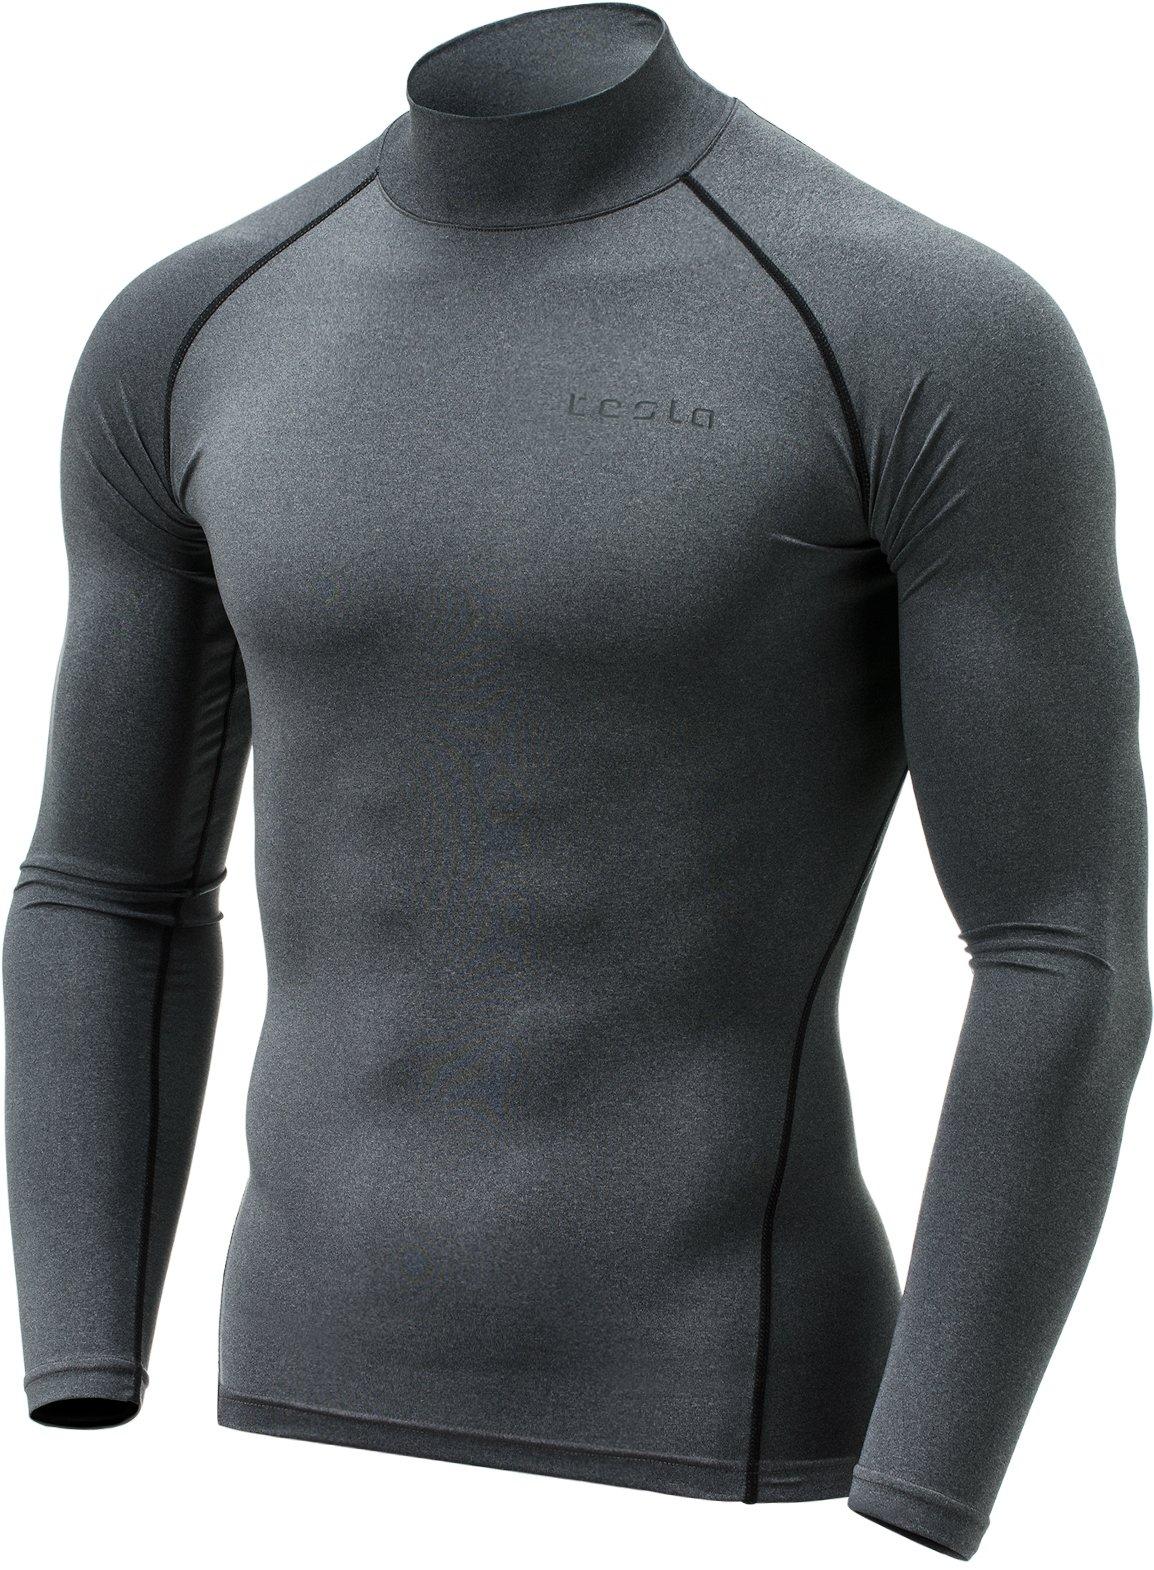 Tesla TM-MUT02-ZDG_Small Men's Mock Long-Sleeved T-Shirt Cool Dry Compression Baselayer MUT02